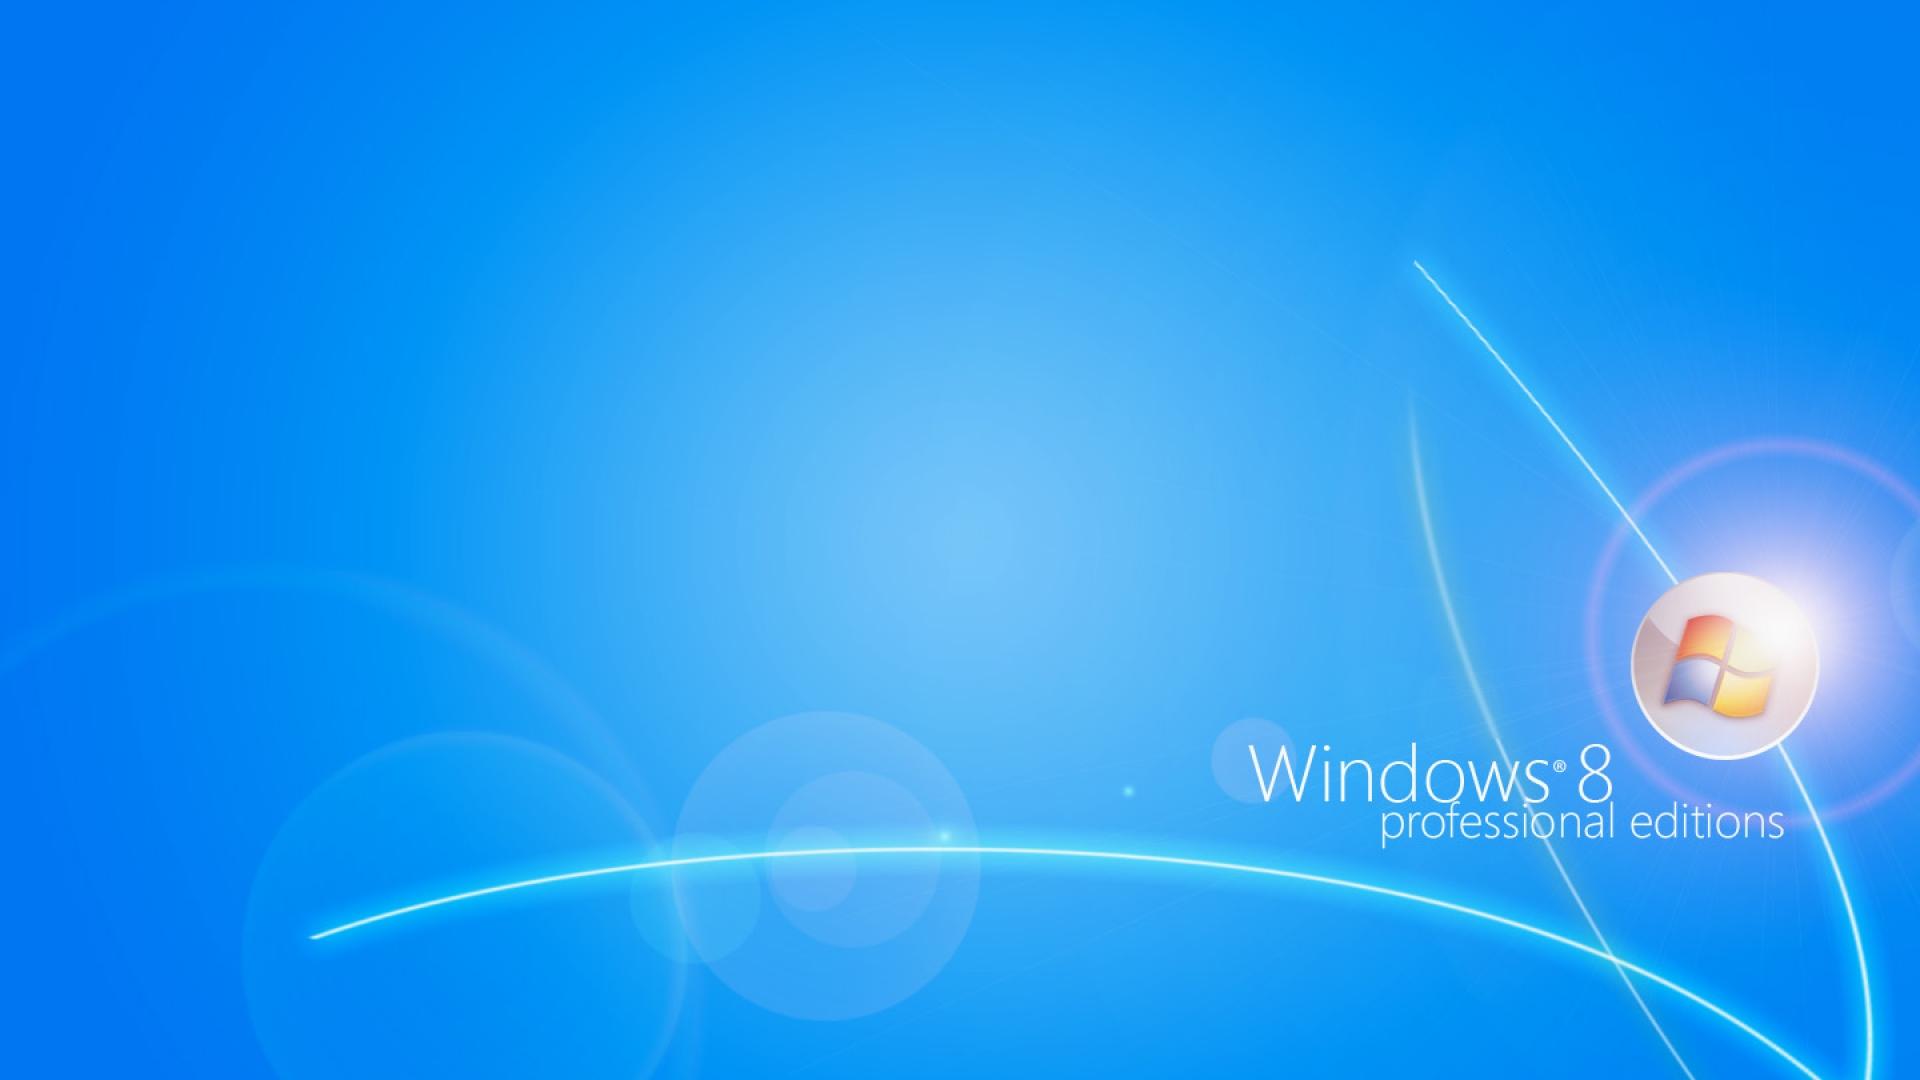 Download windows 8 professional wallpaper HD wallpaper 1920x1080